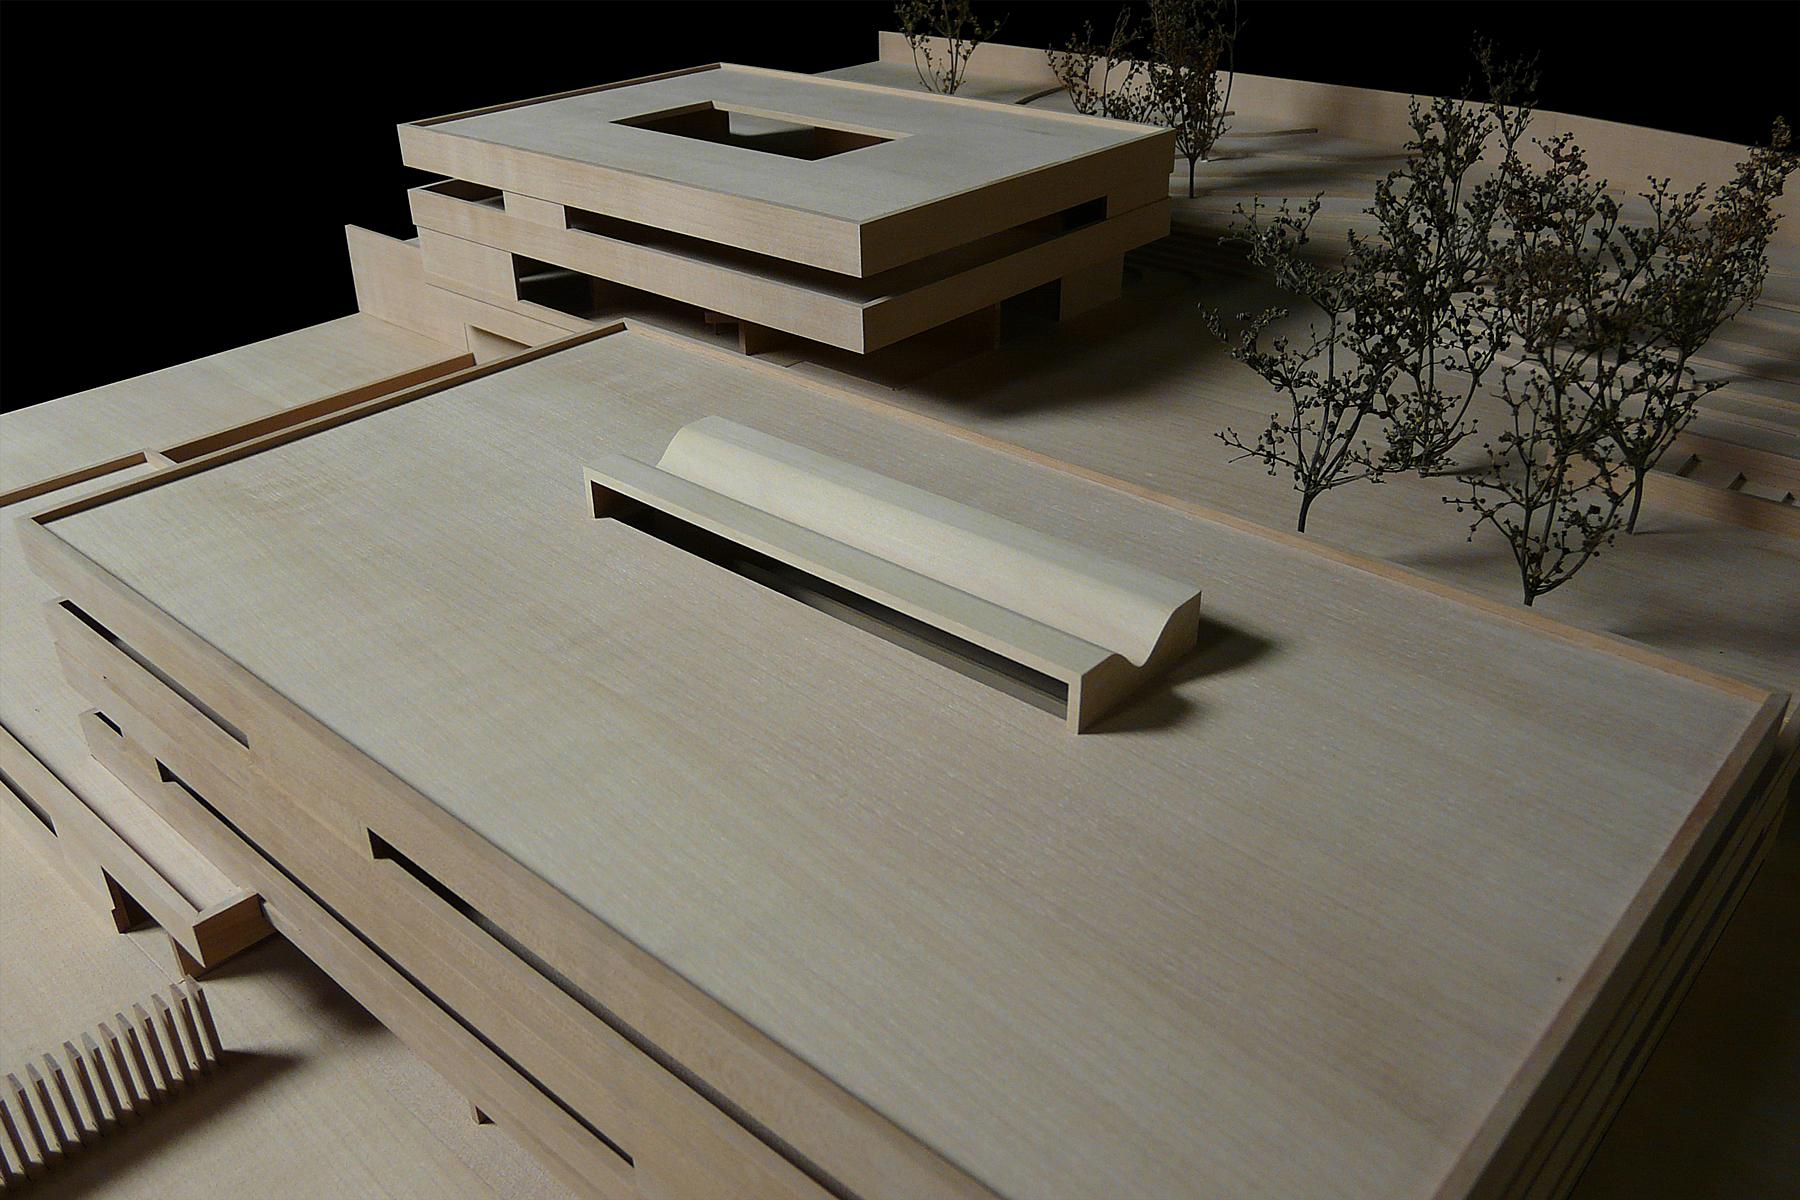 architekturmodell deutsche botschaft tiflis b la berec. Black Bedroom Furniture Sets. Home Design Ideas